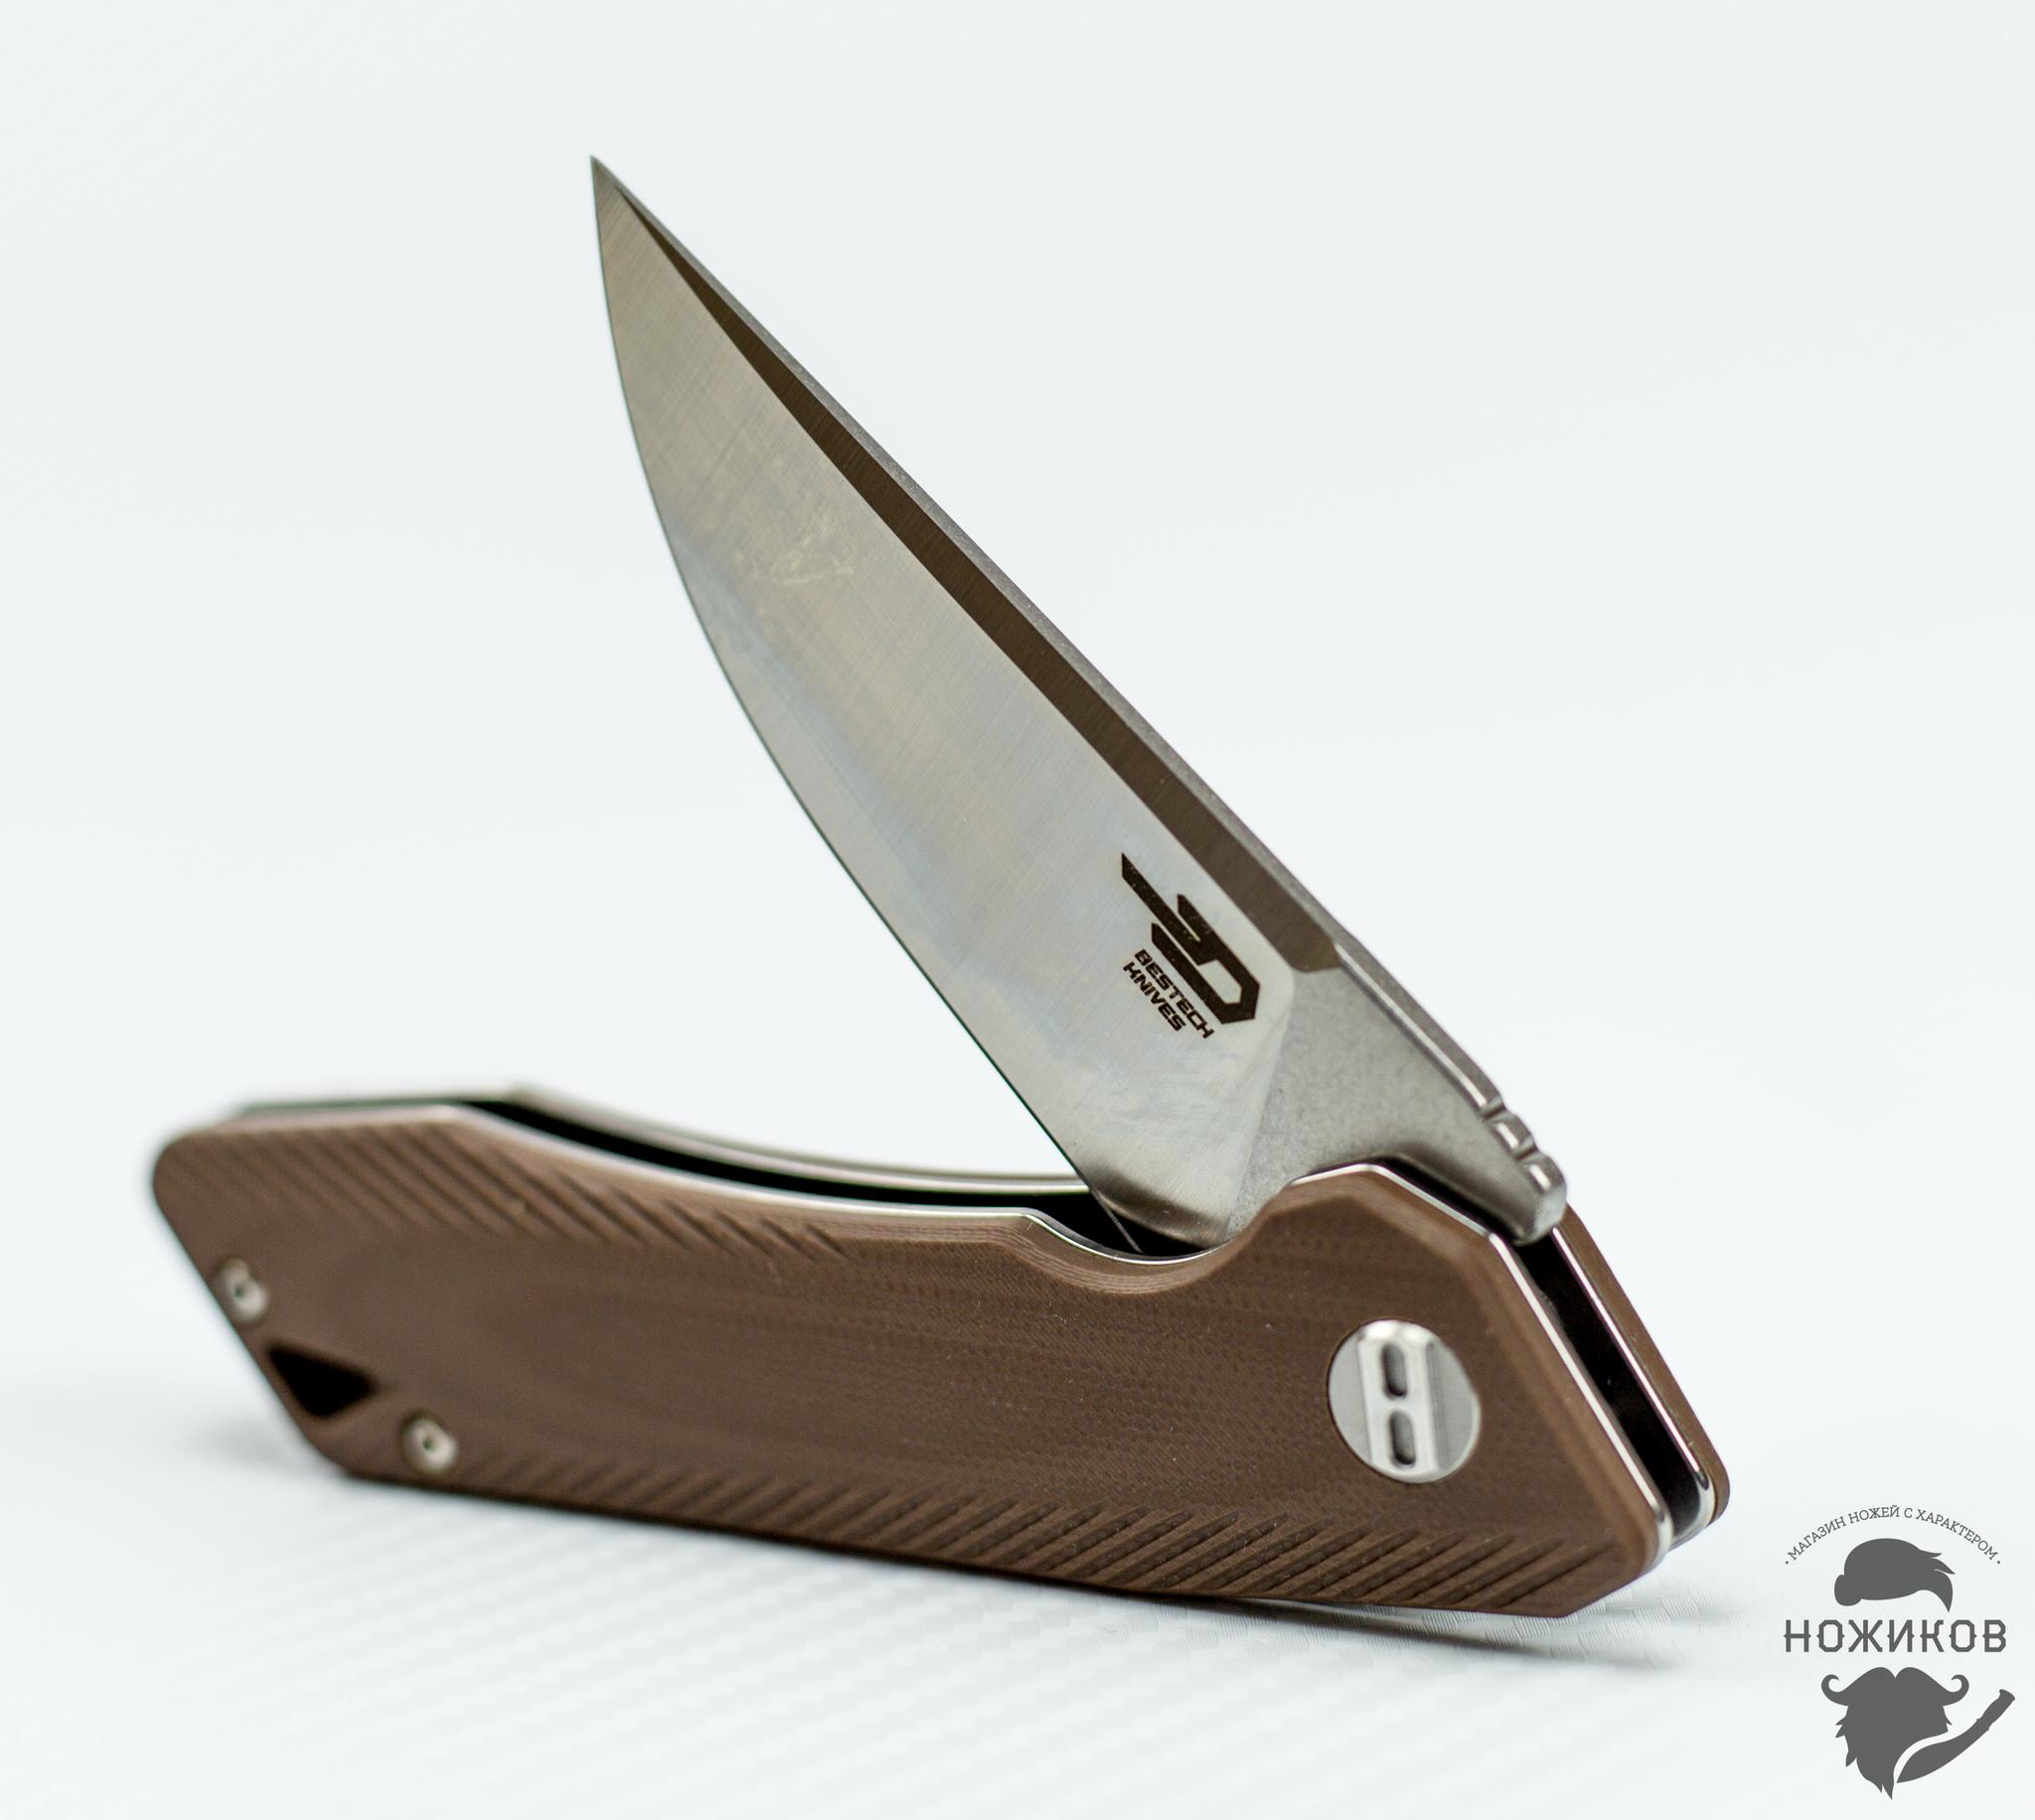 Складной нож Bestech Thorn BG10C-2, сталь Sandvik 12C27